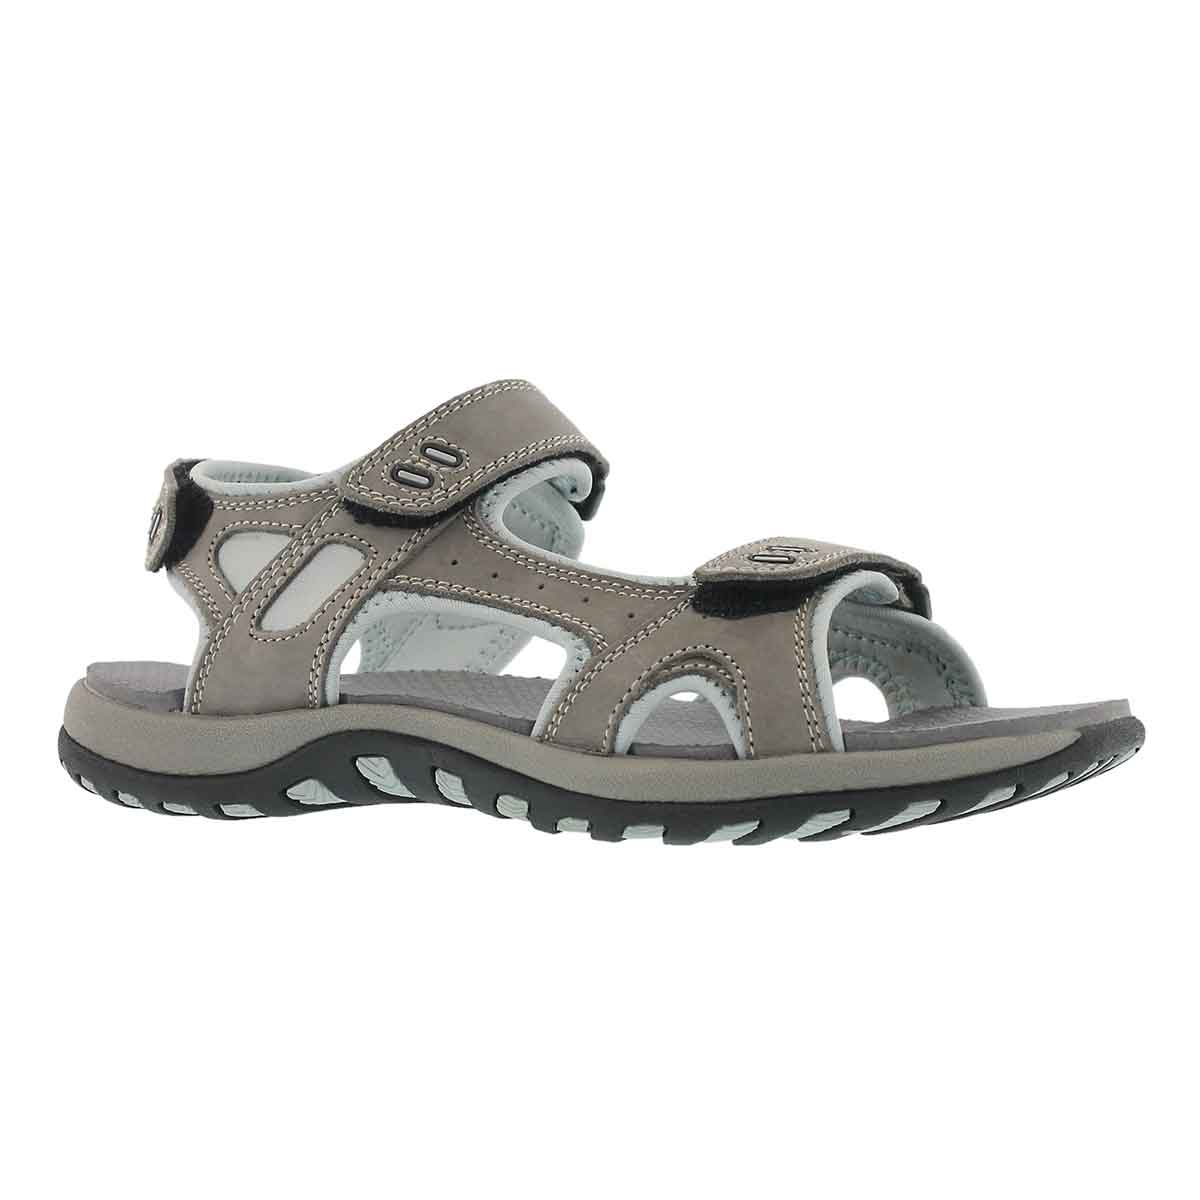 Women's COURTNEY grey 3 strap sport sandal